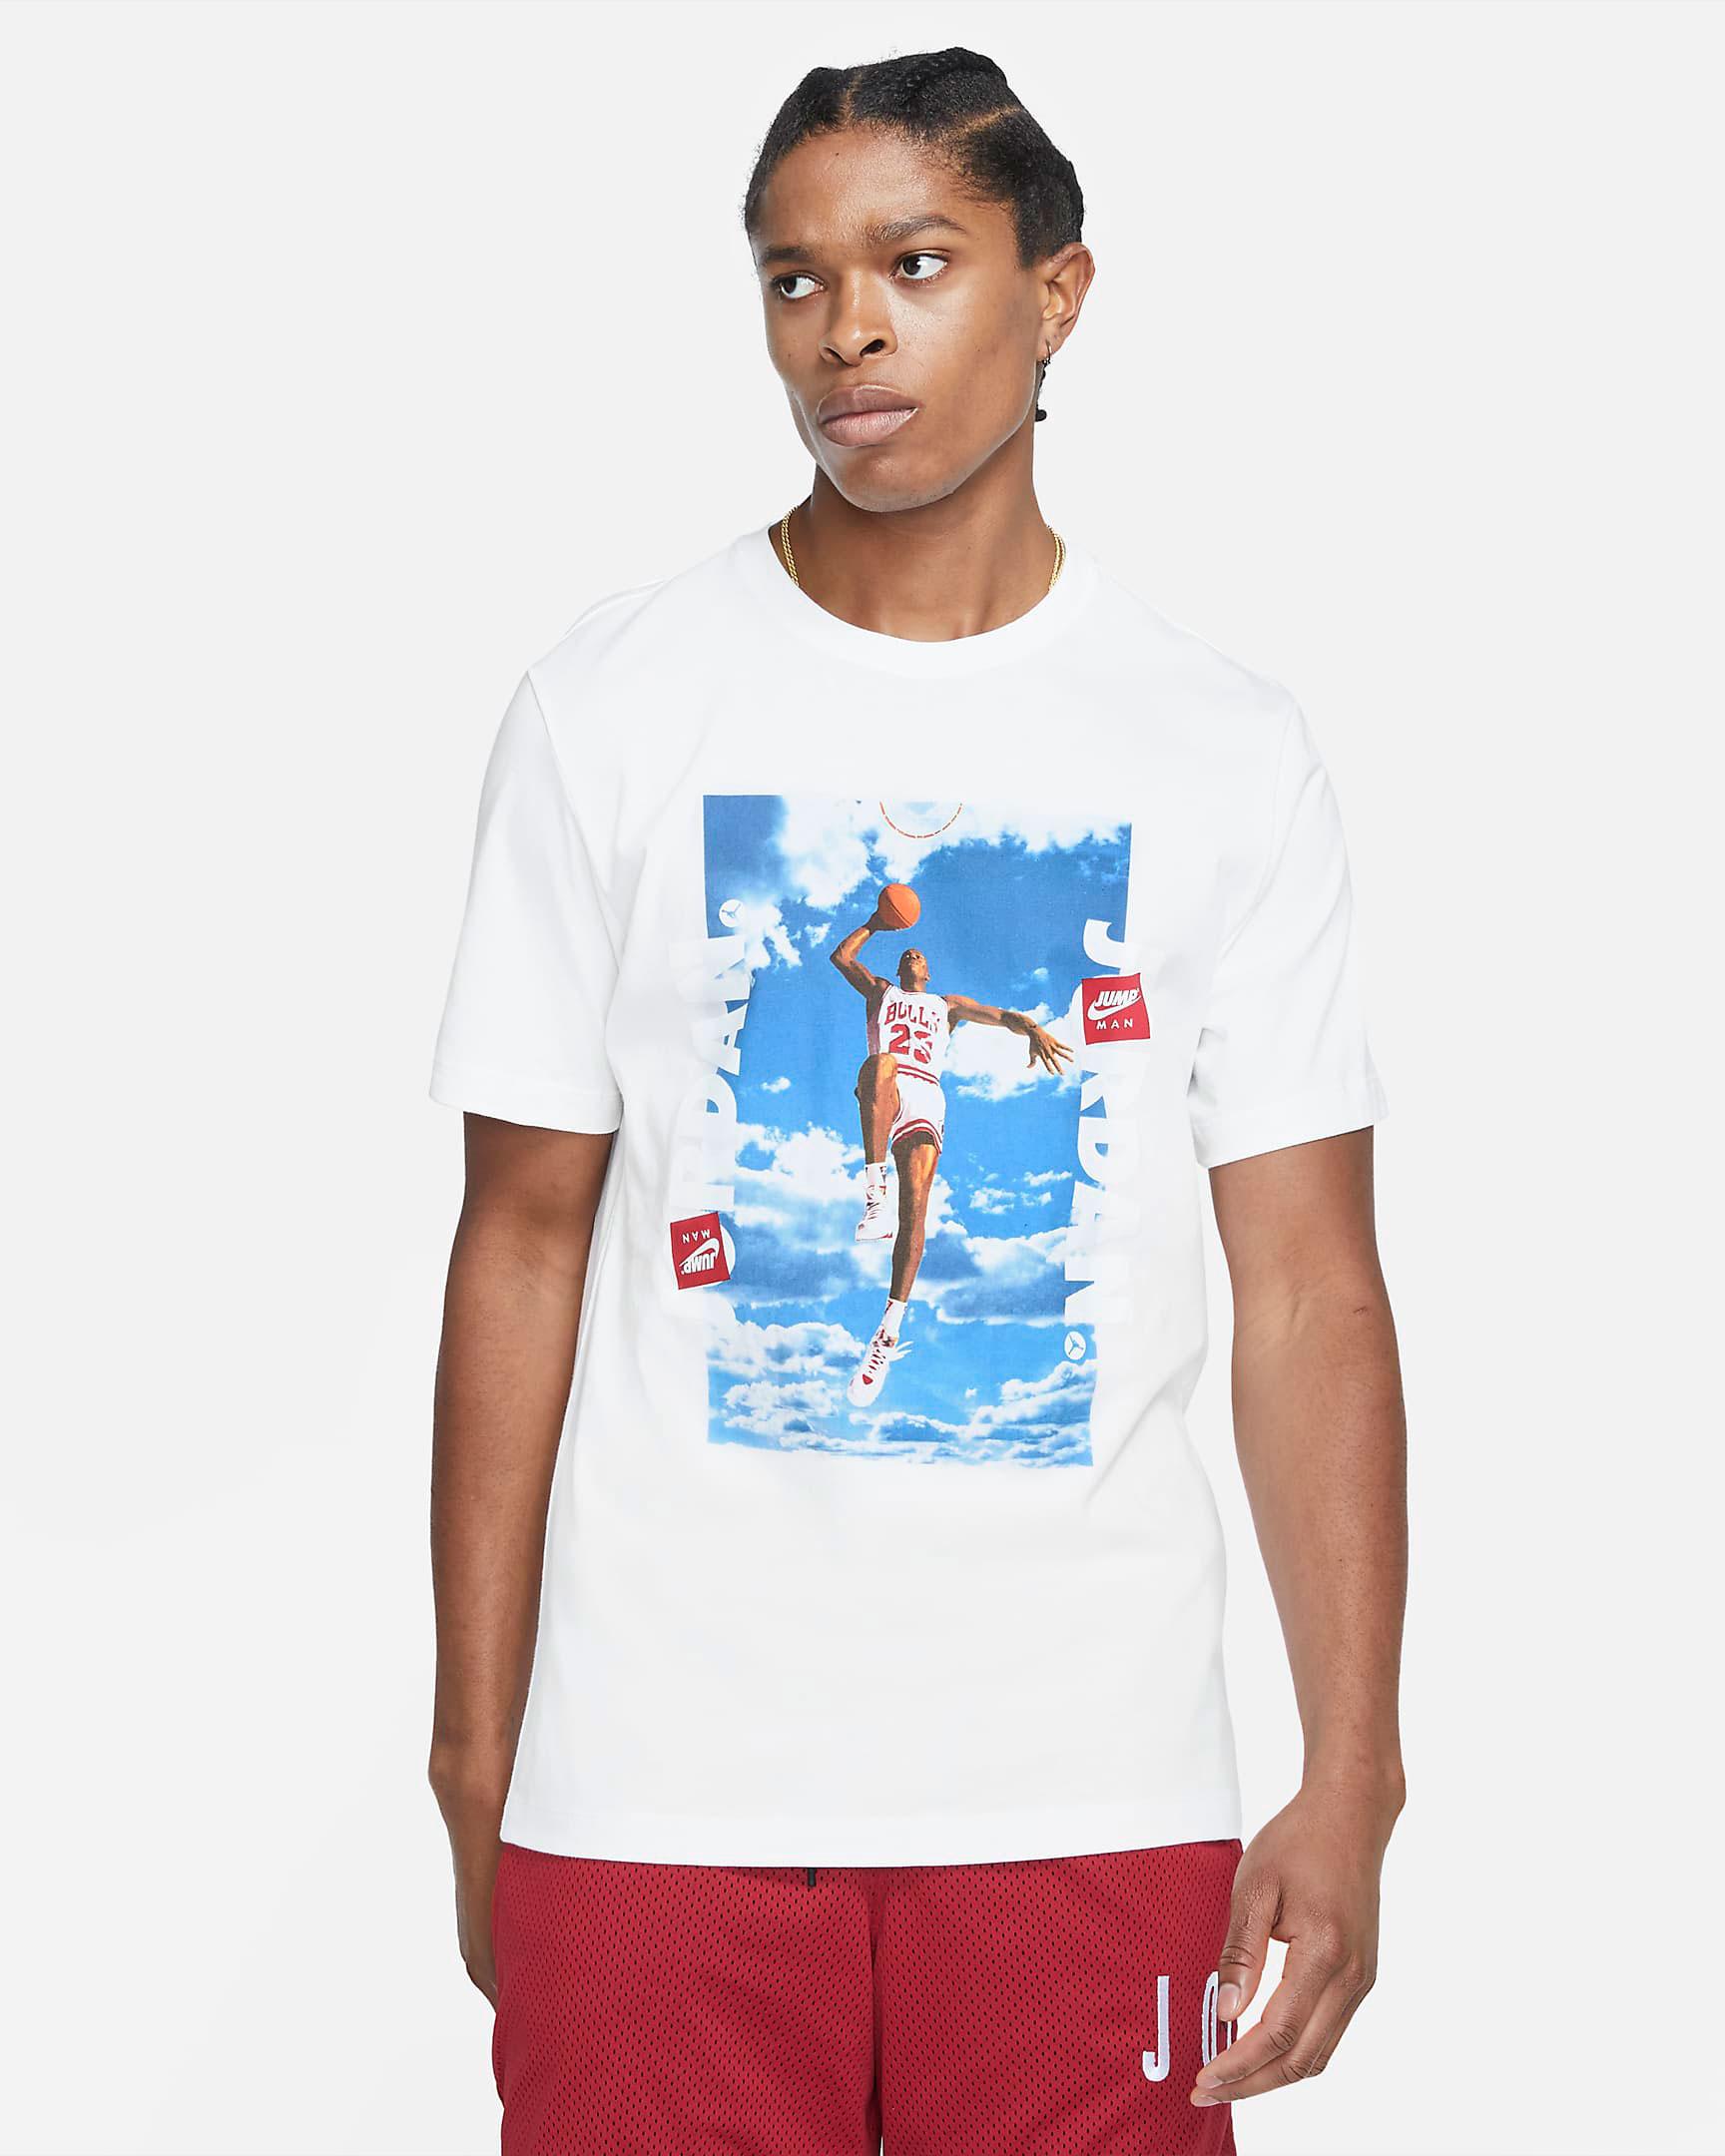 jordan-6-carmine-2021-tee-shirt